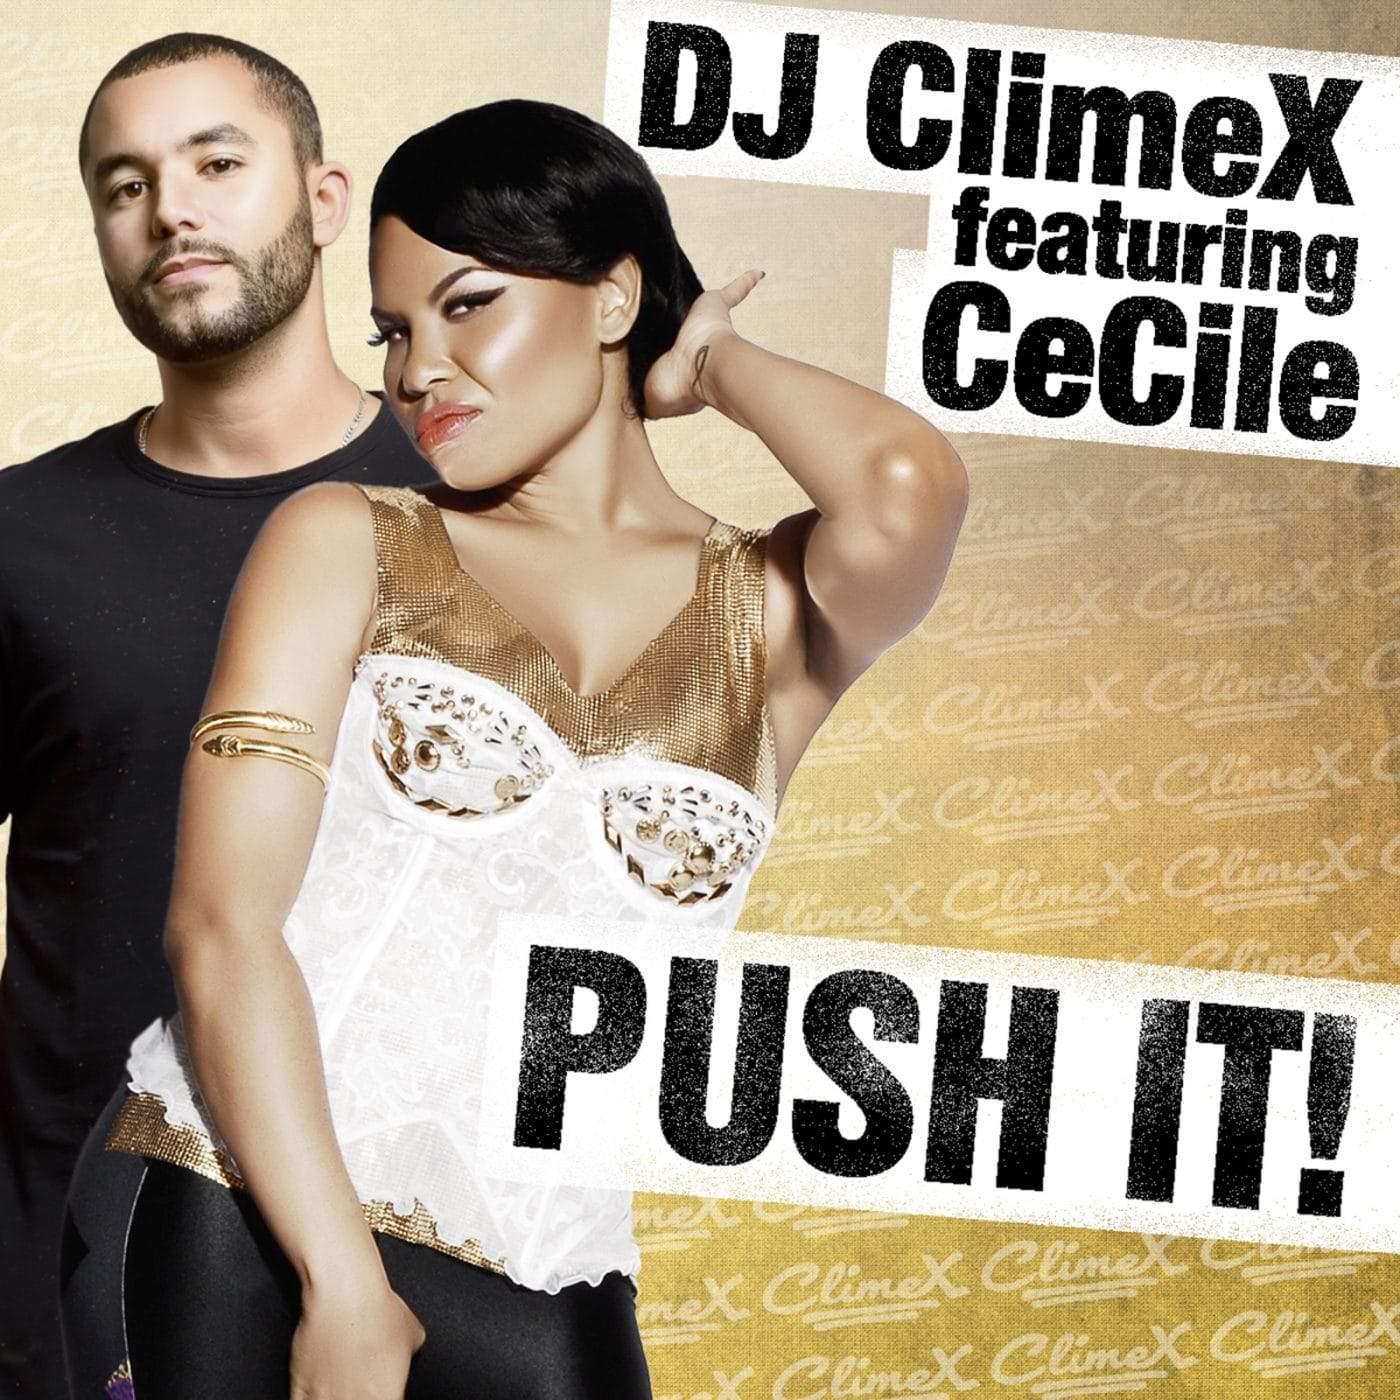 Dj ClimeX ft CeCile - Push It